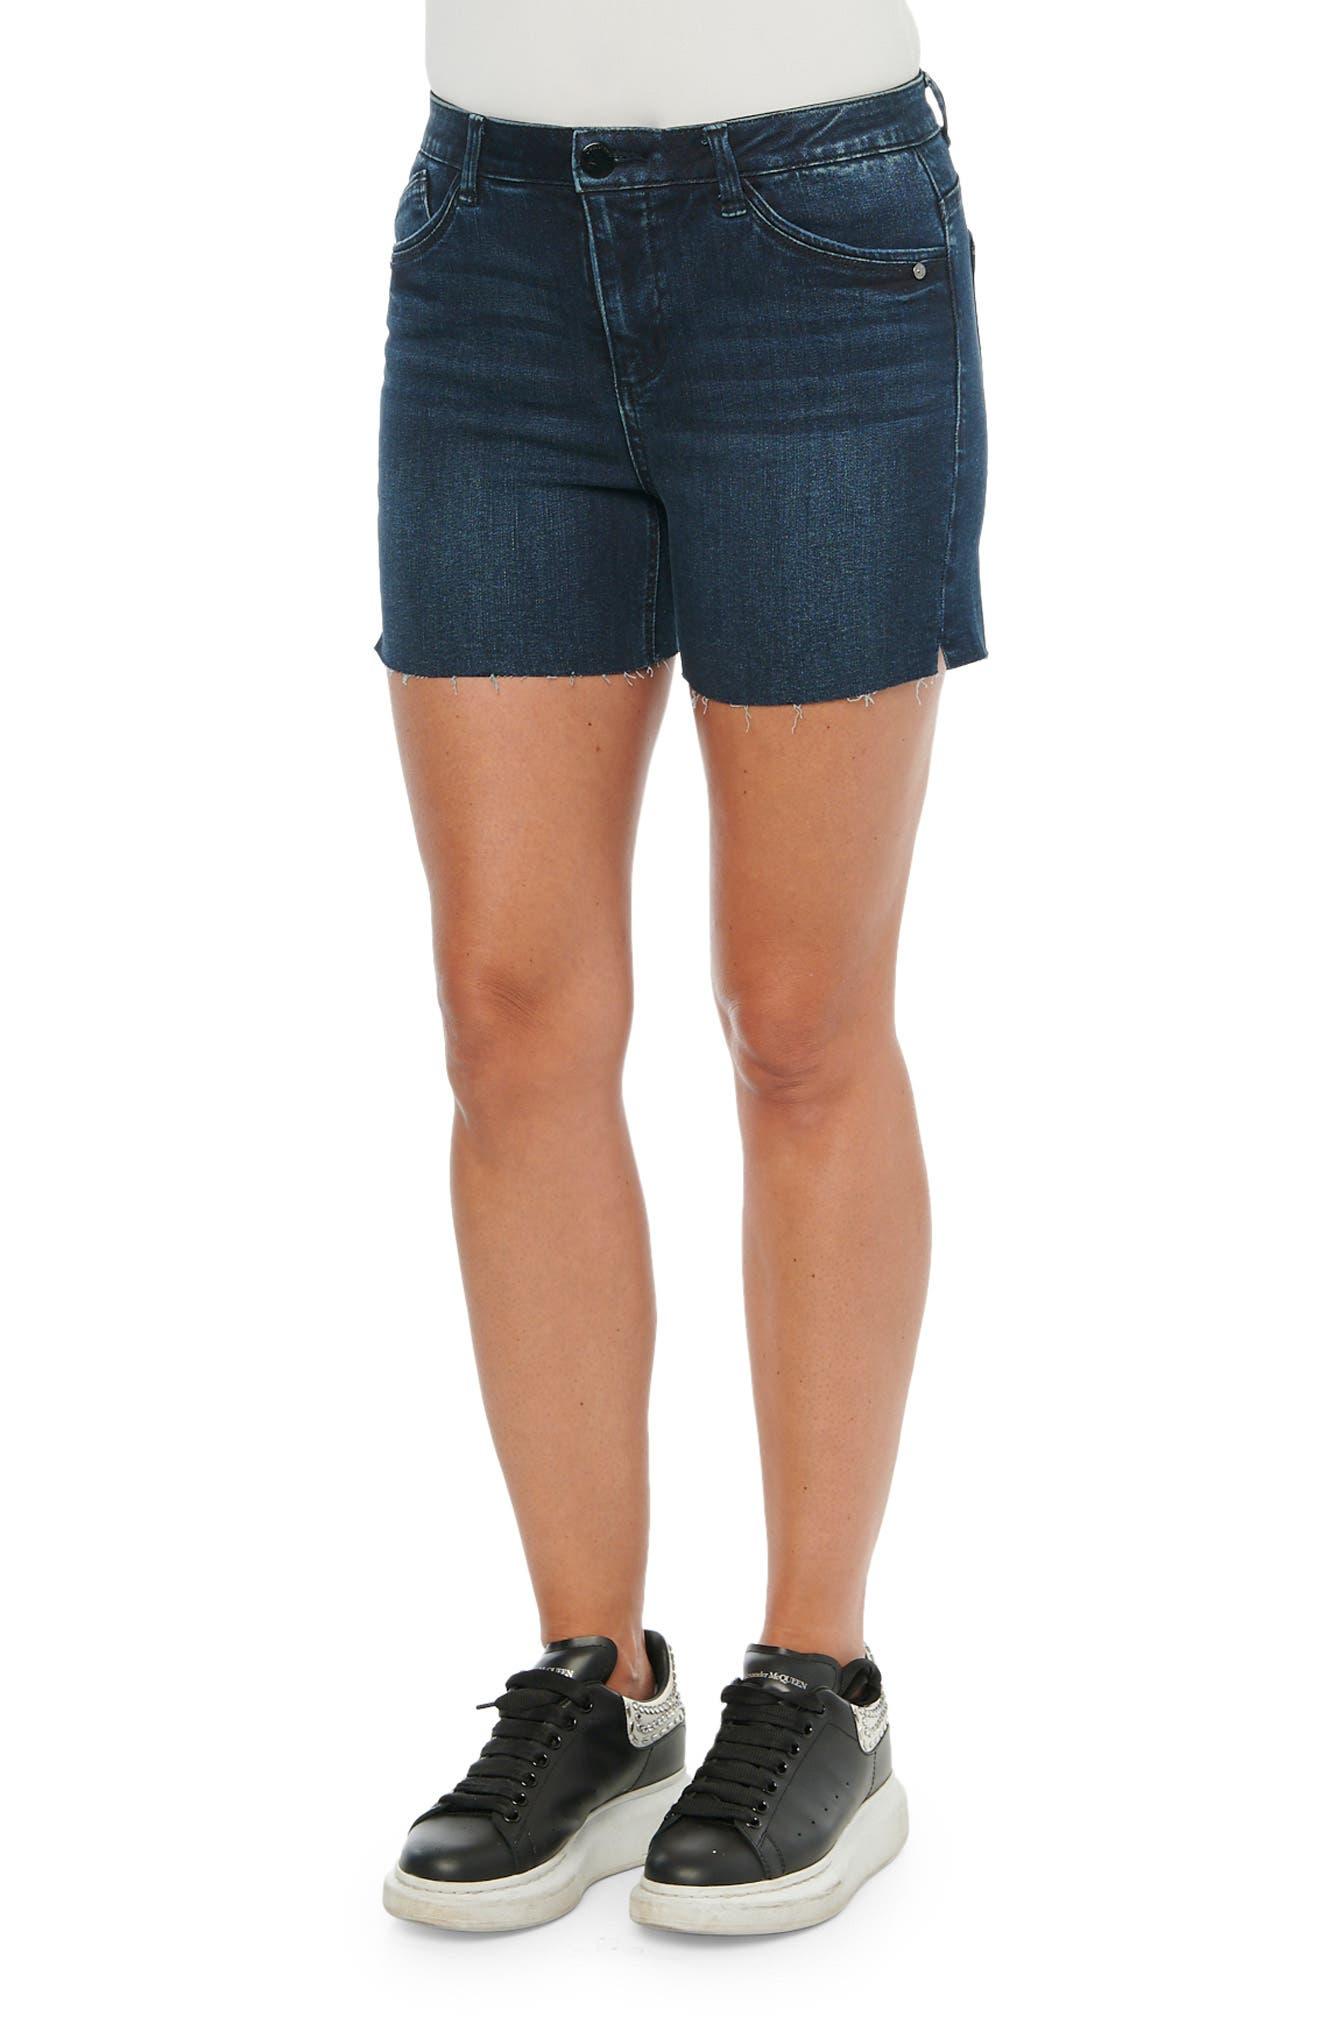 Men Boyfriend shorts LONDON Navy Blue High Waist Shorts Double Belt High Waisted Shorts Unisex